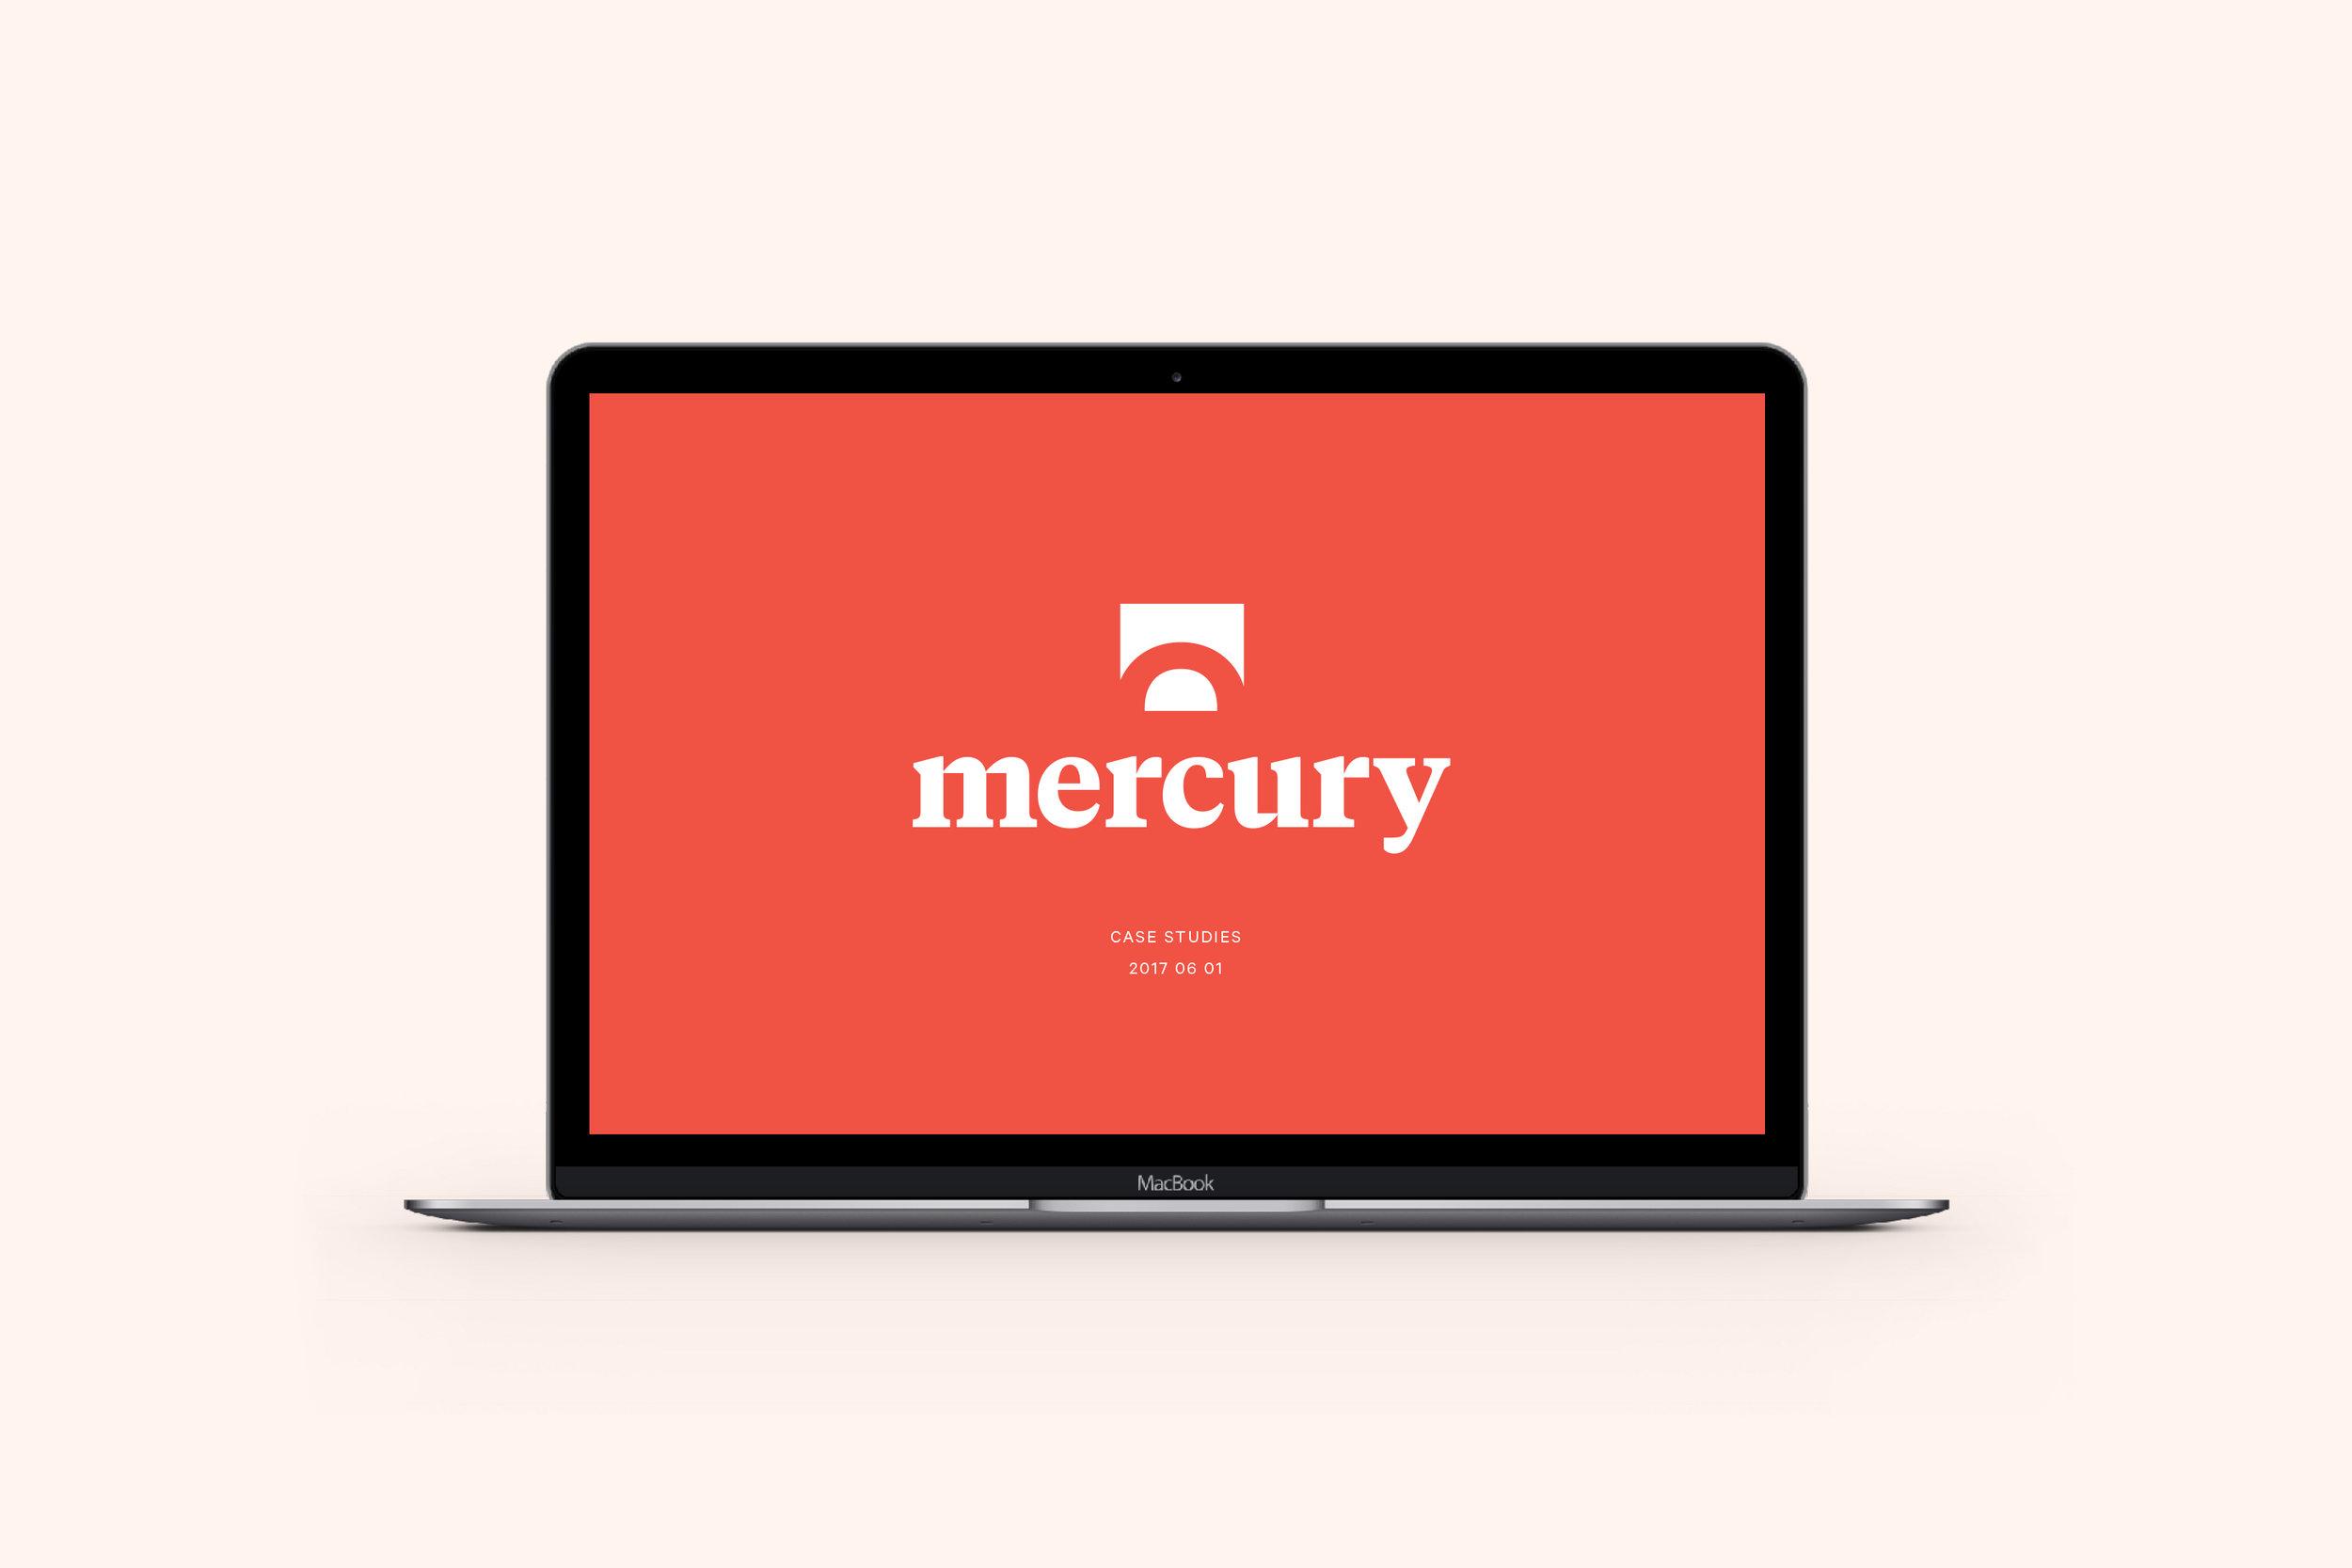 mercury_ppt_01.jpg